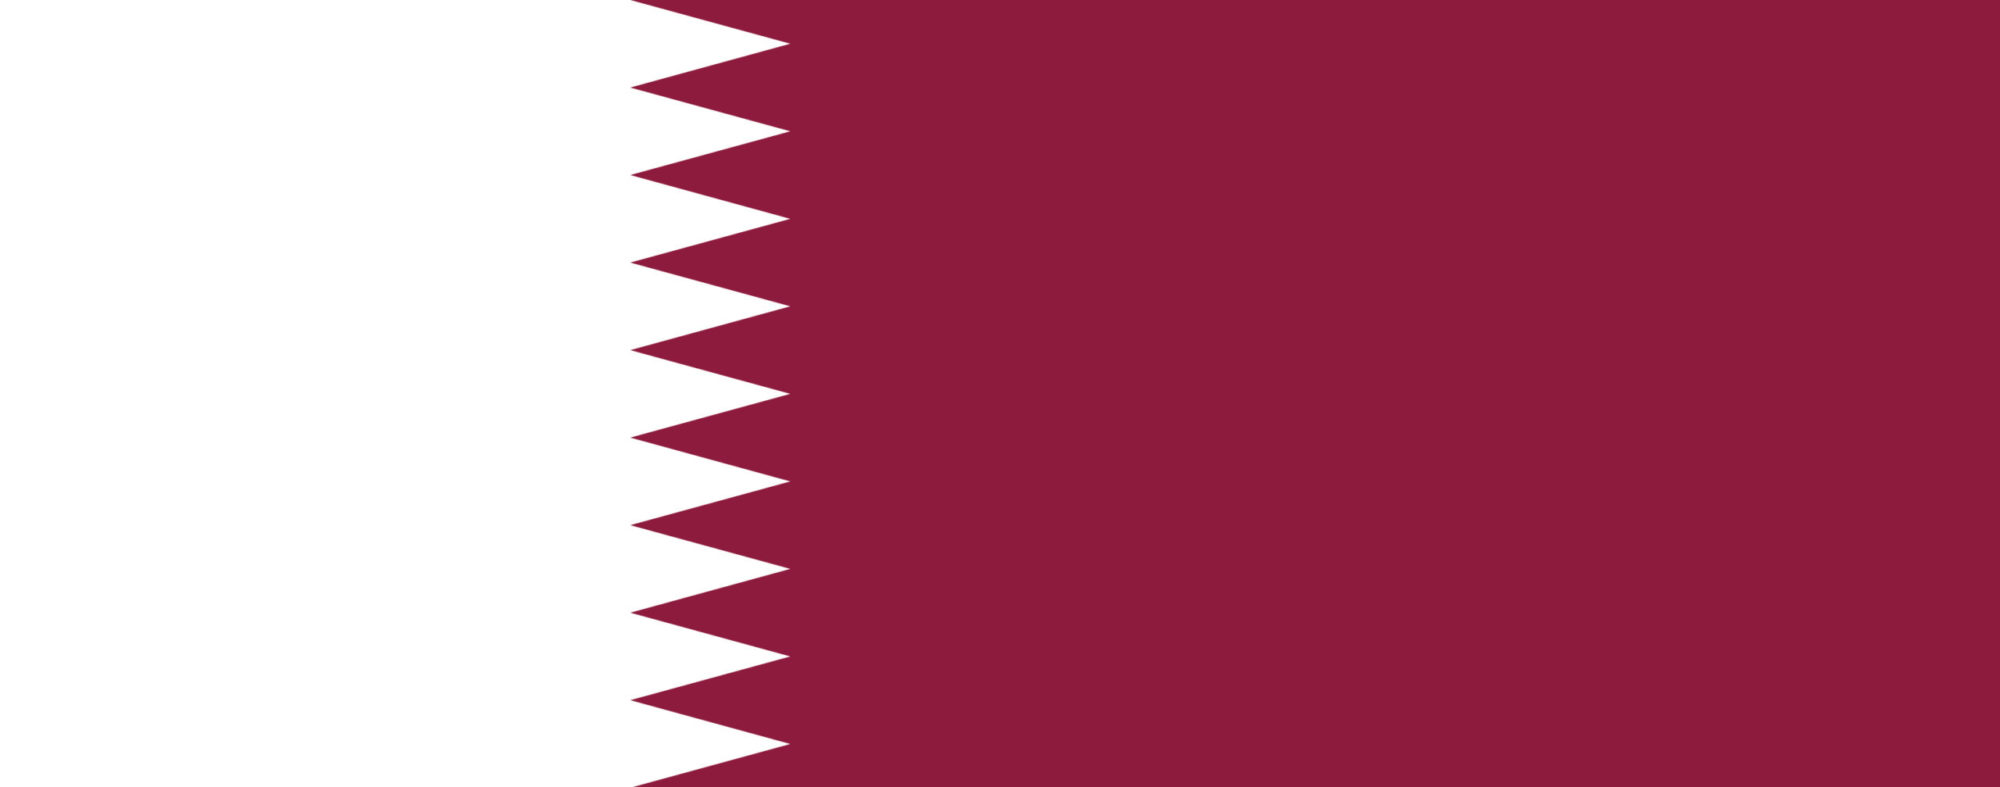 National Anthem of Qatar   Symbols of Qatar